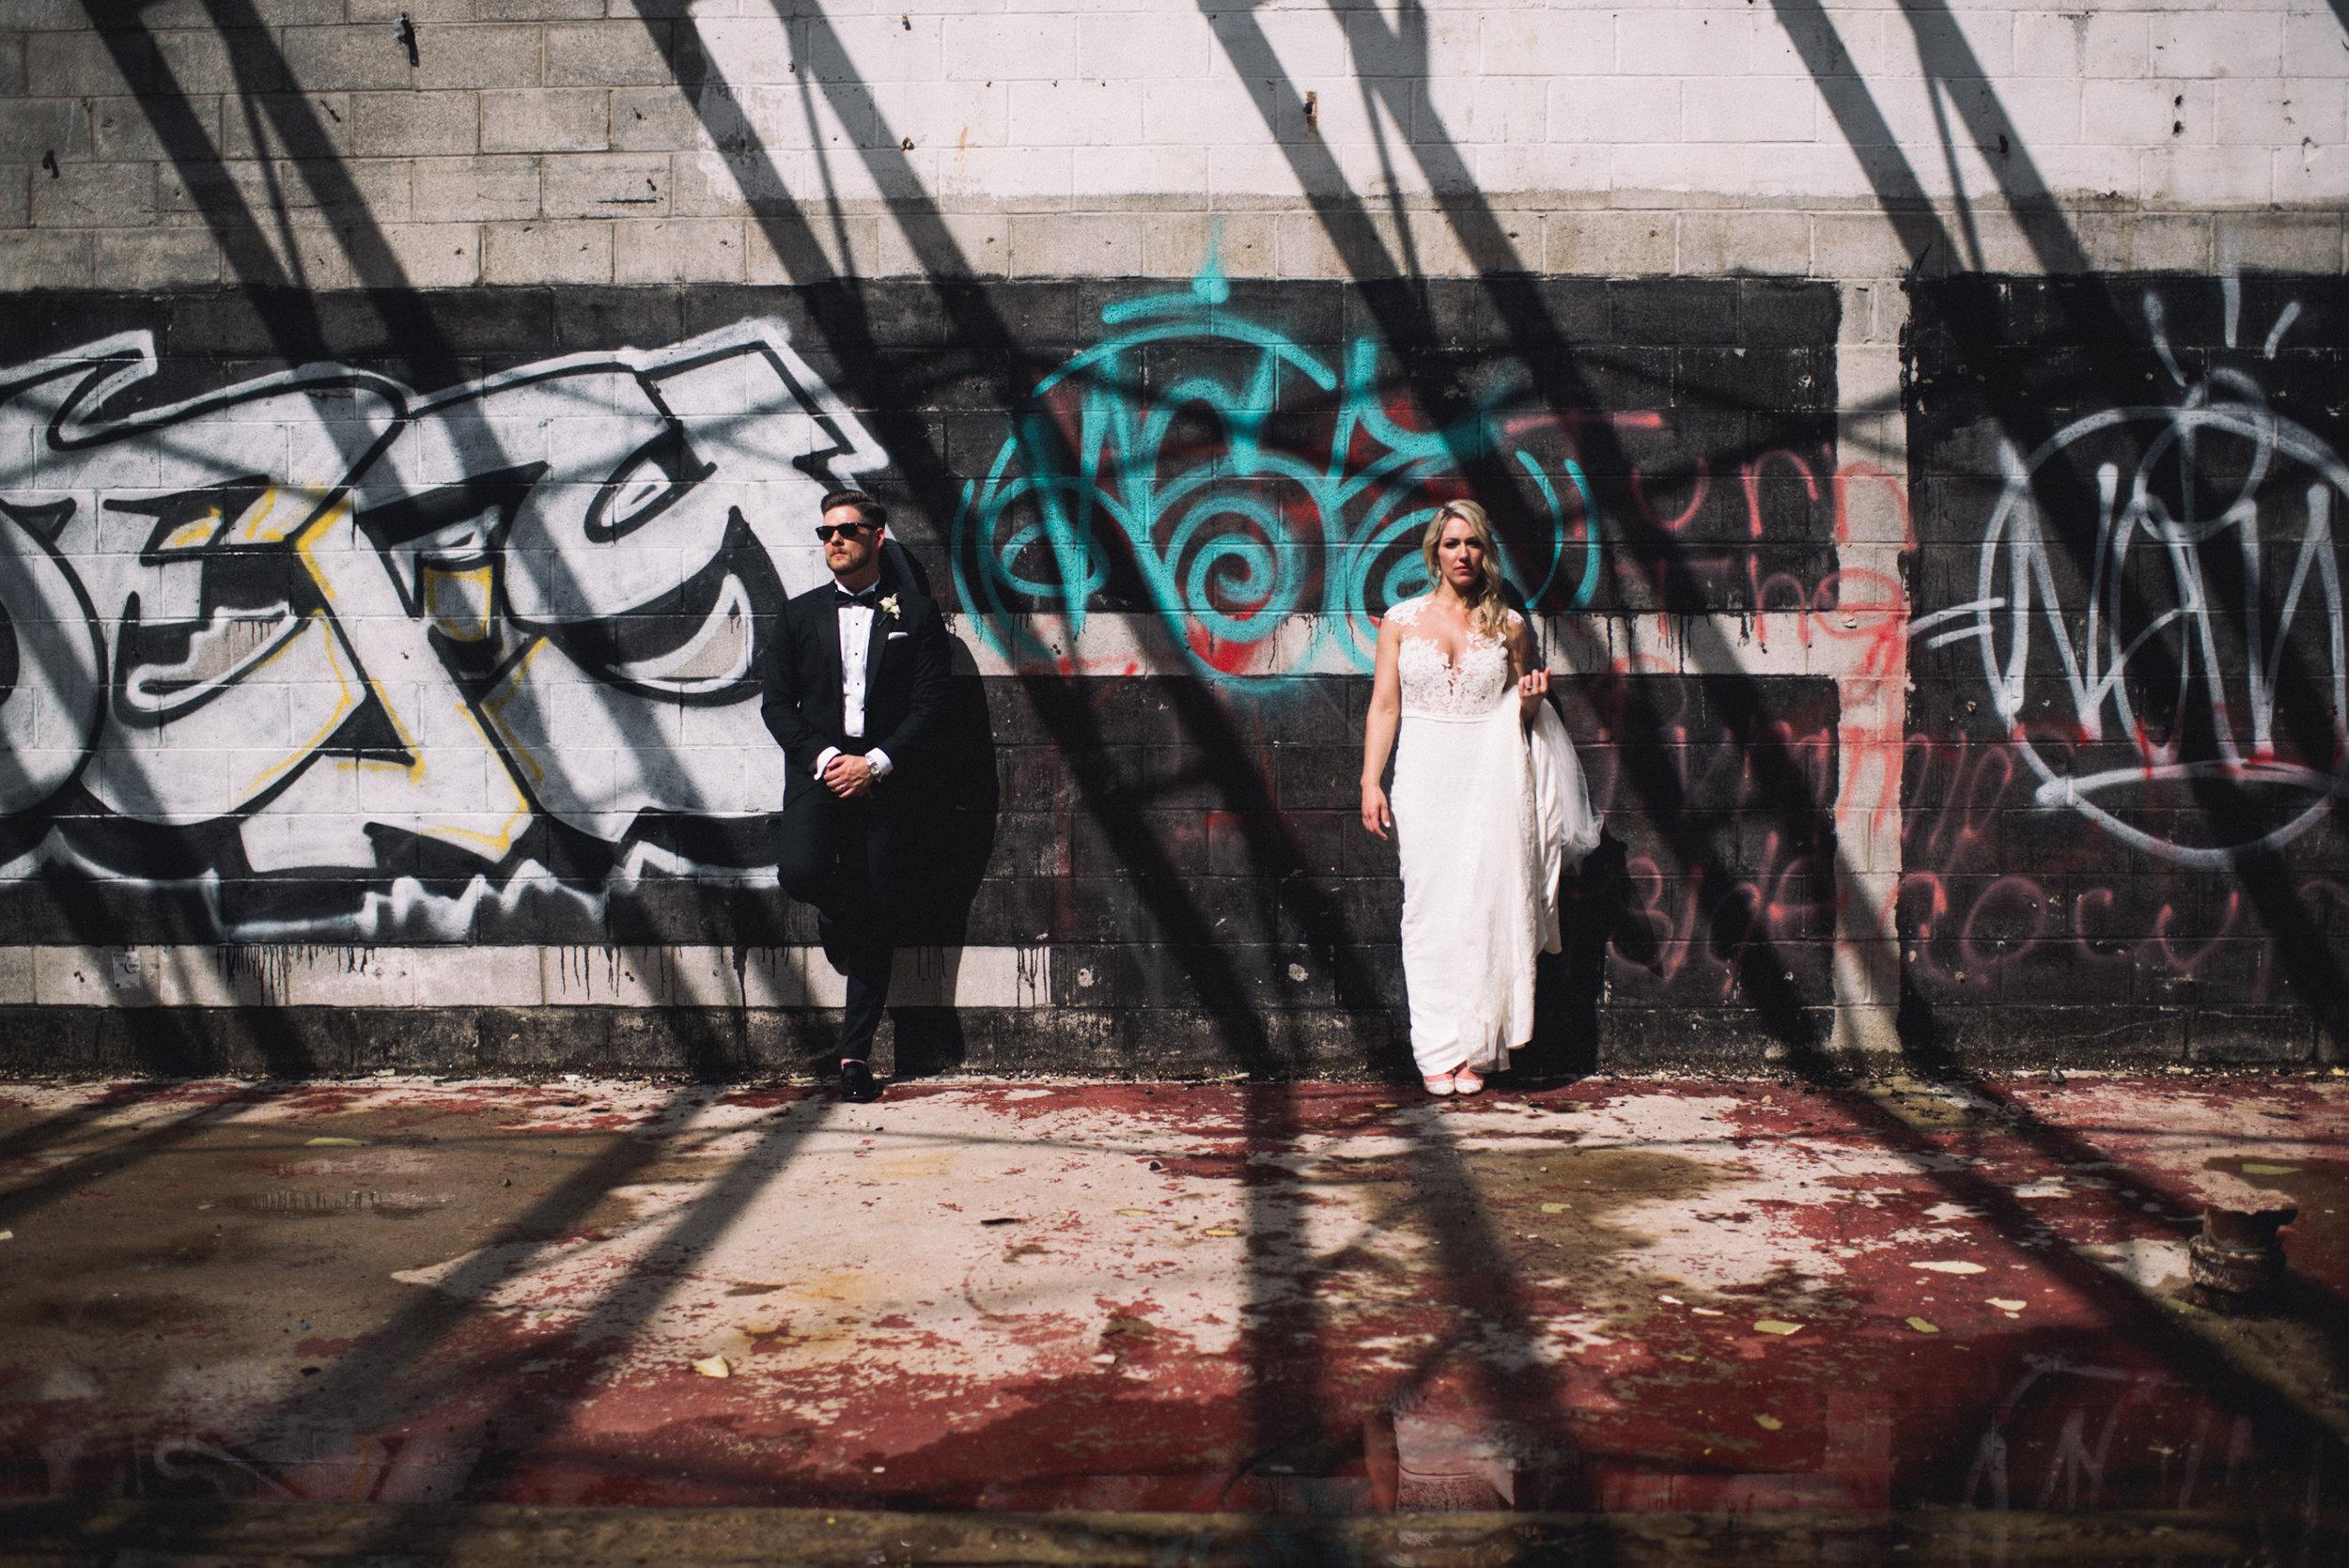 Pittsburgh Pennsylvania New York NYC Wedding Photographer Photojournalist Luxury Downtown Opera - Stirpe 1075.jpg